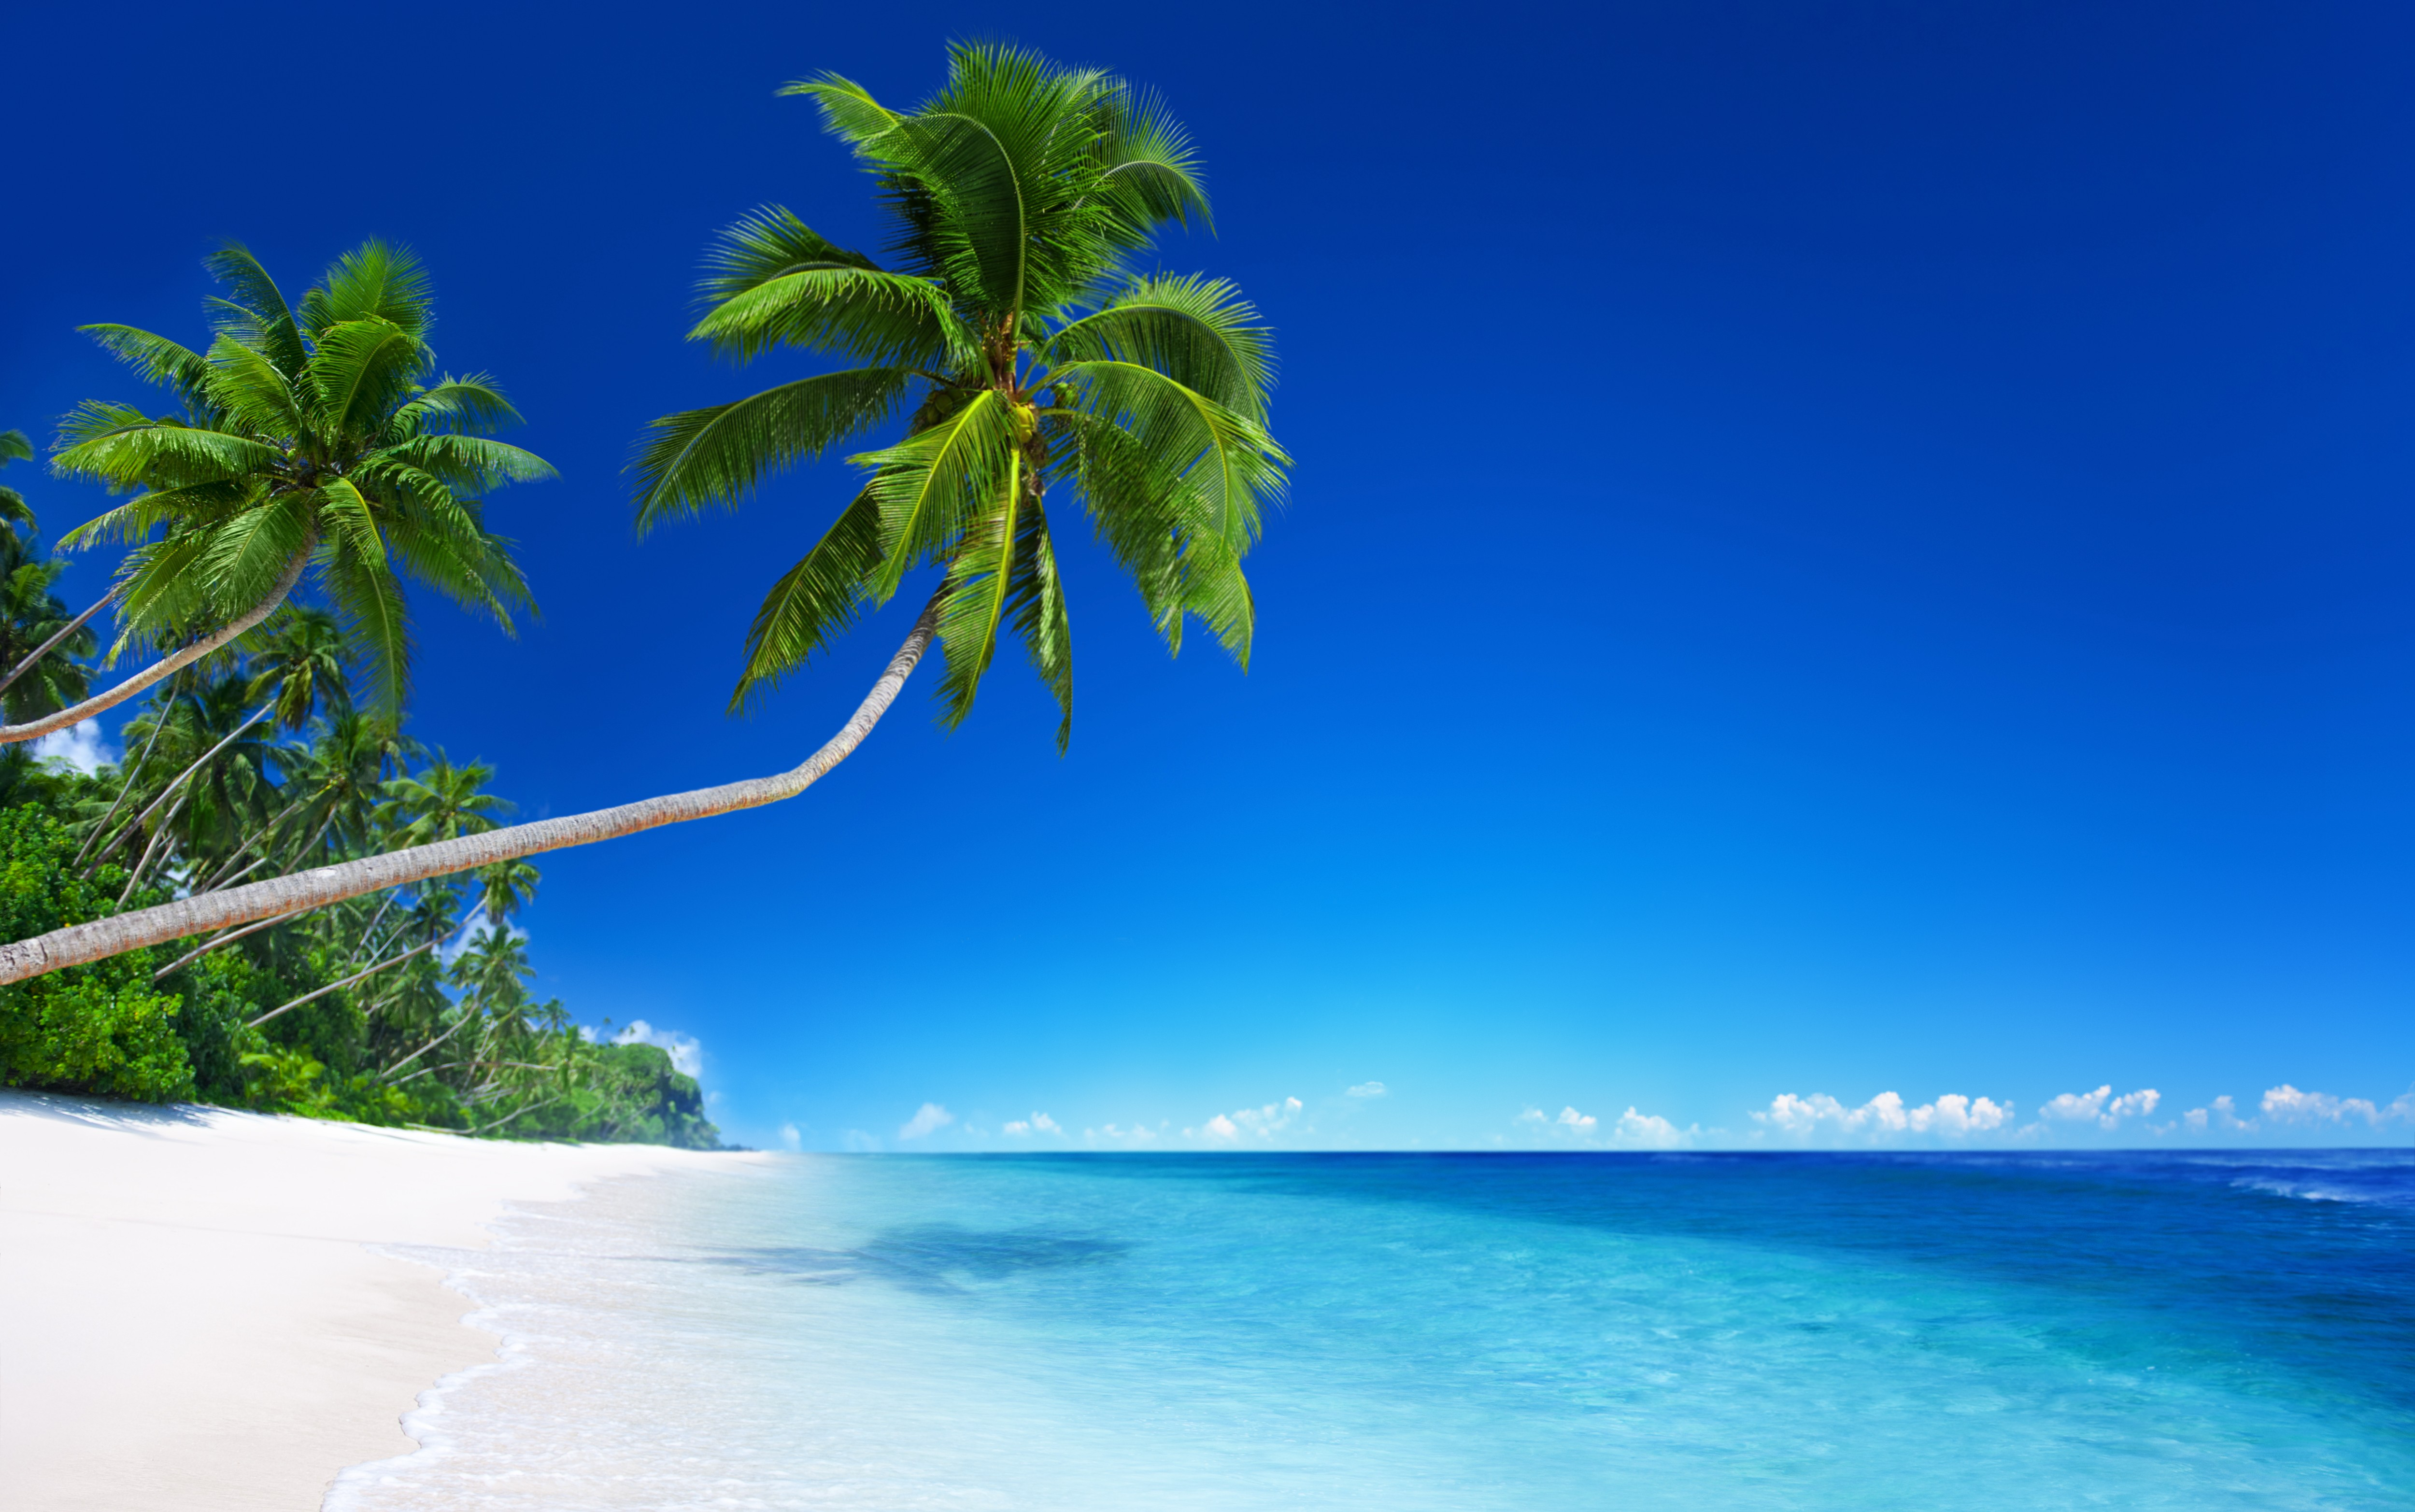 Palm Trees On Tropical Beach 4k Ultra Hd Wallpaper Hintergrund 5000x3131